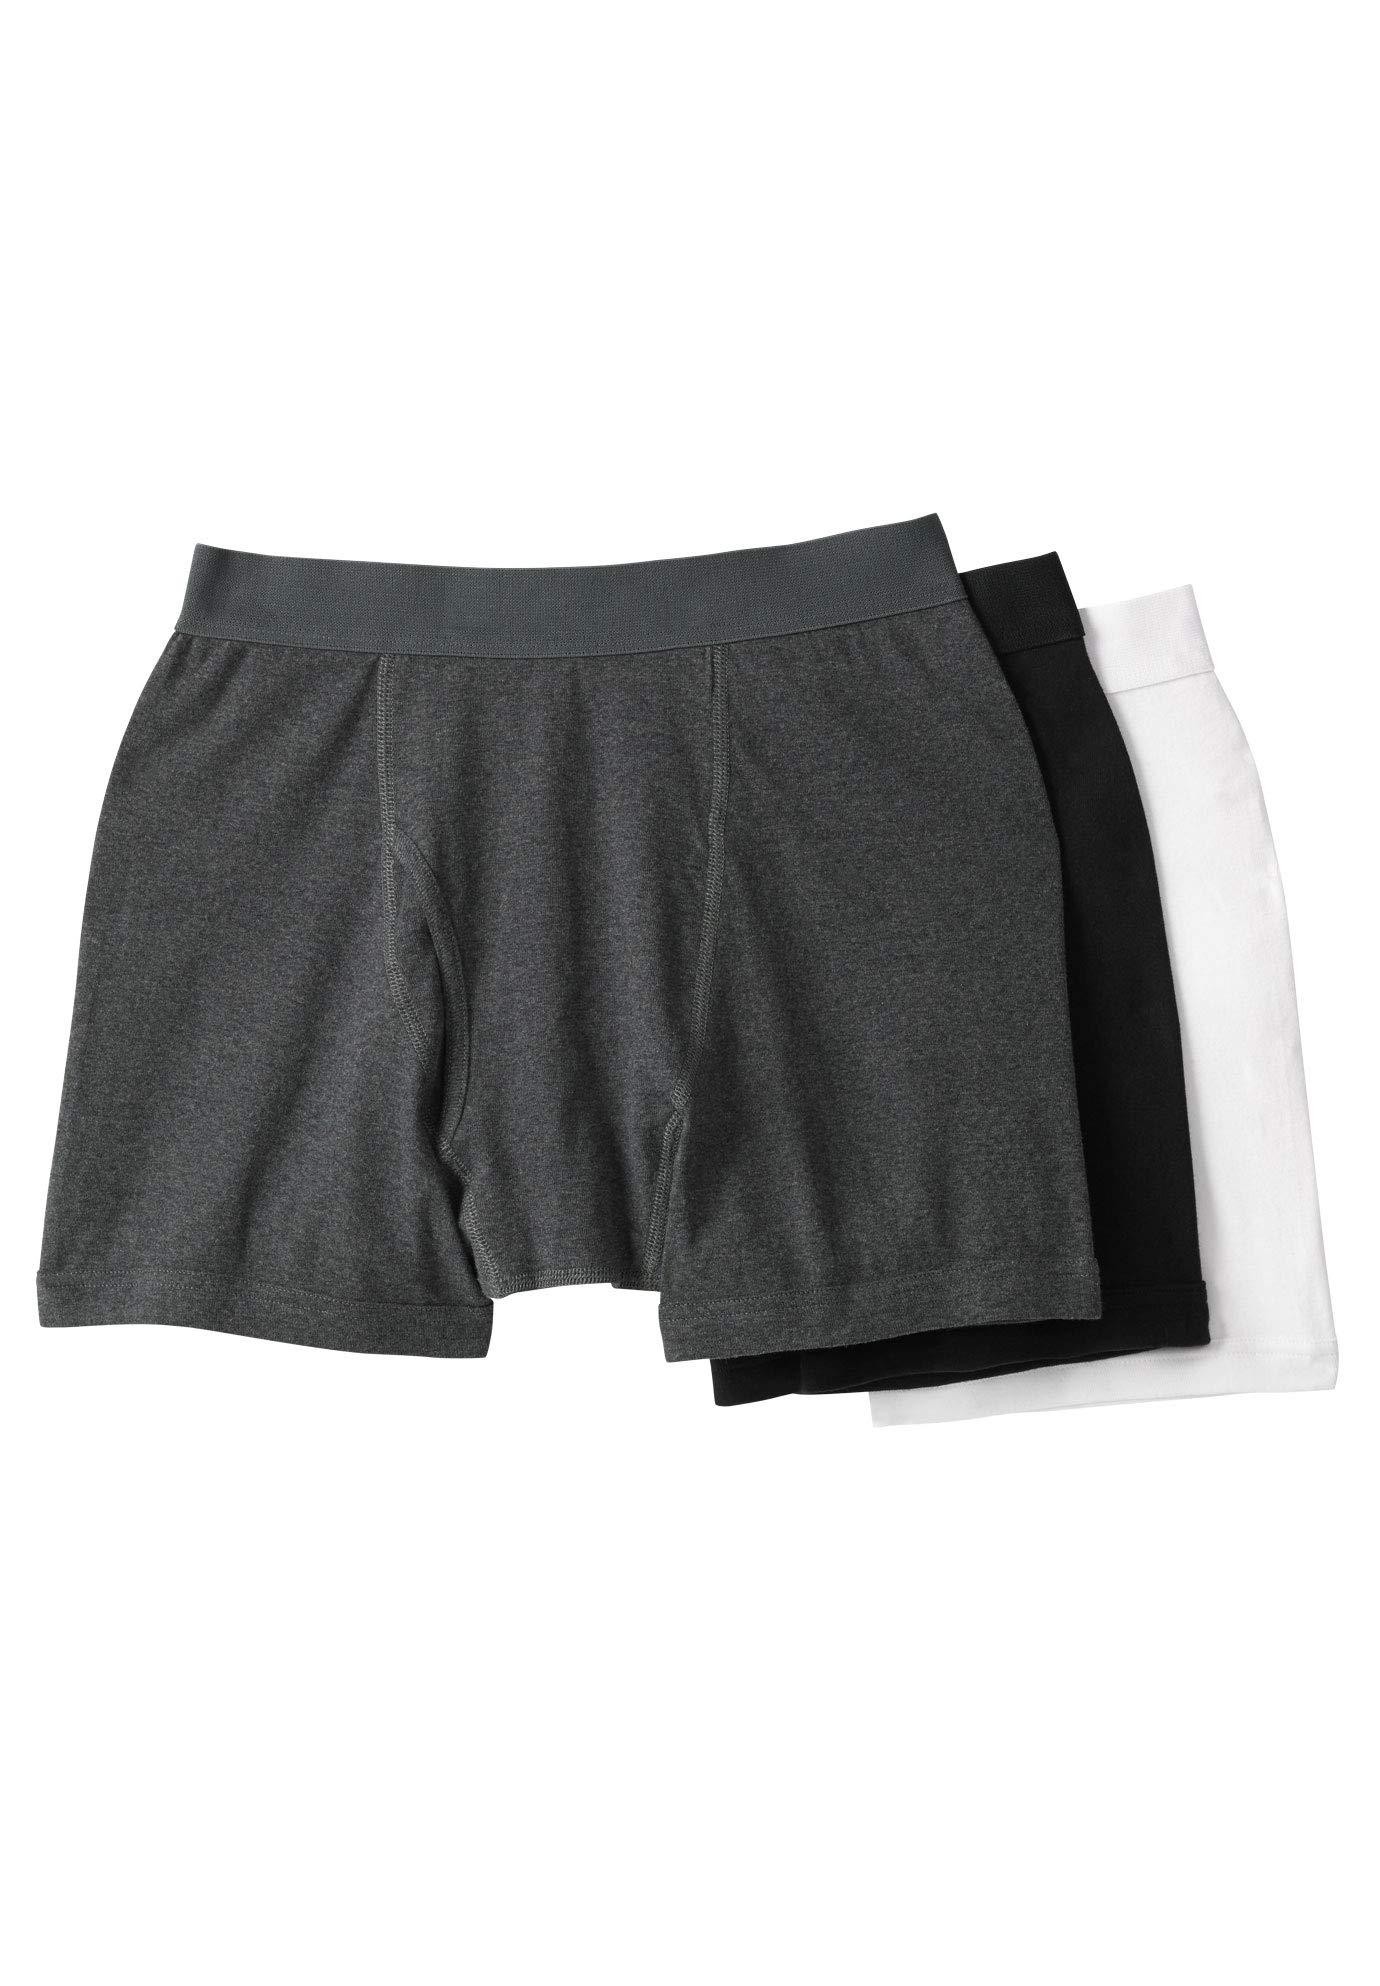 KingSize Men's Big & Tall Cotton Boxer Briefs 3-Pack, Assorted Basic Big-6XL